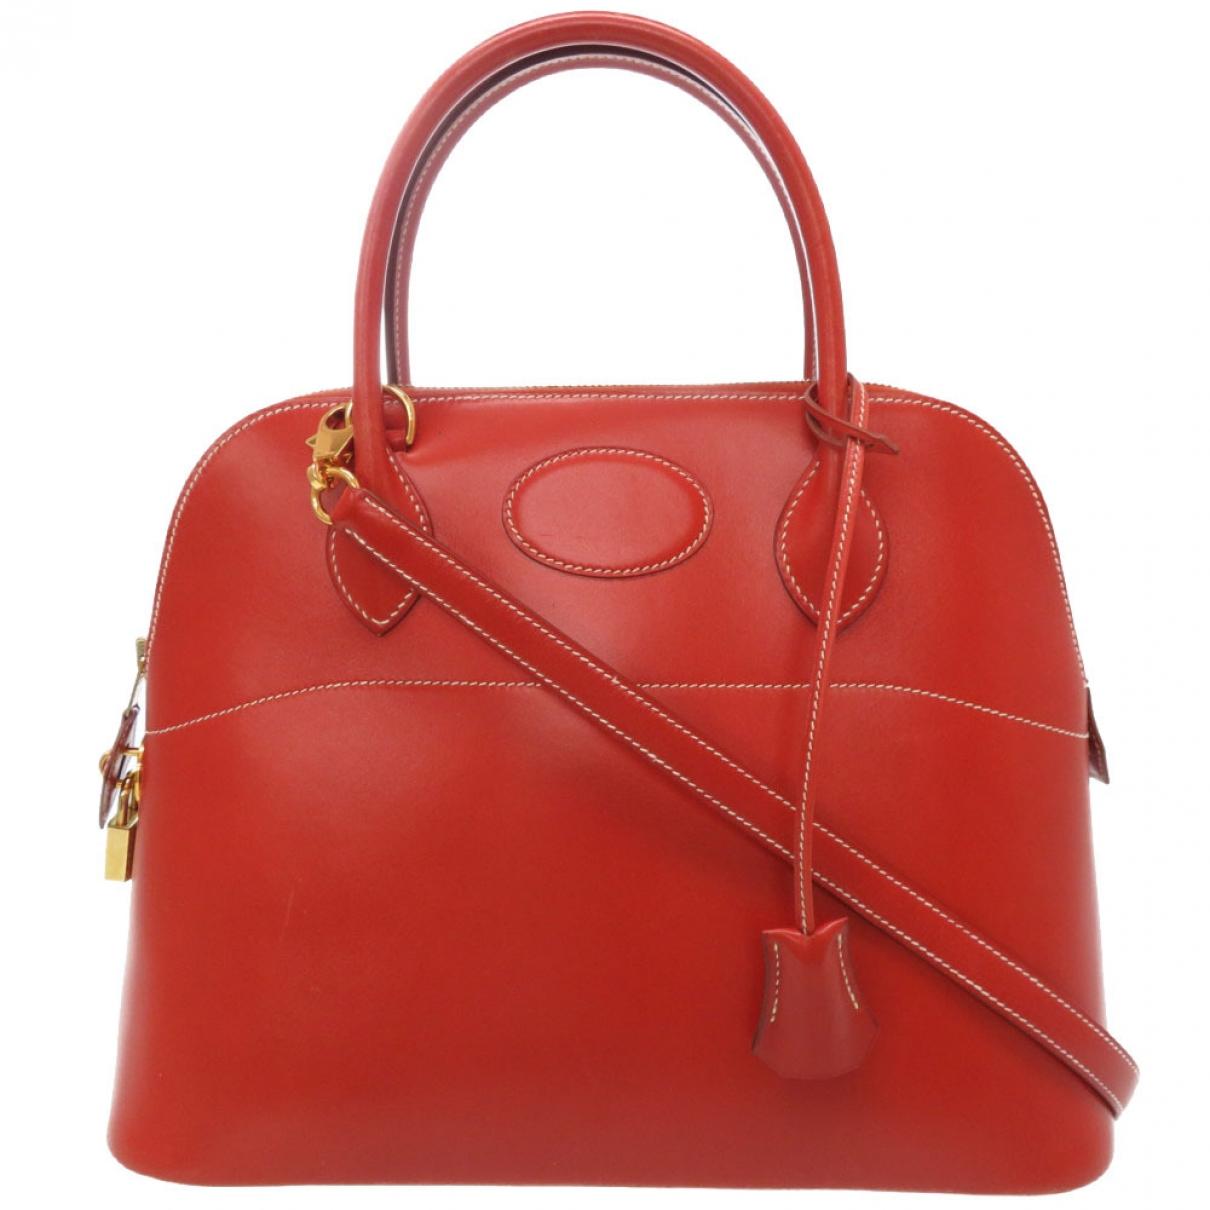 Hermes Bolide Handtasche in  Rot Leder